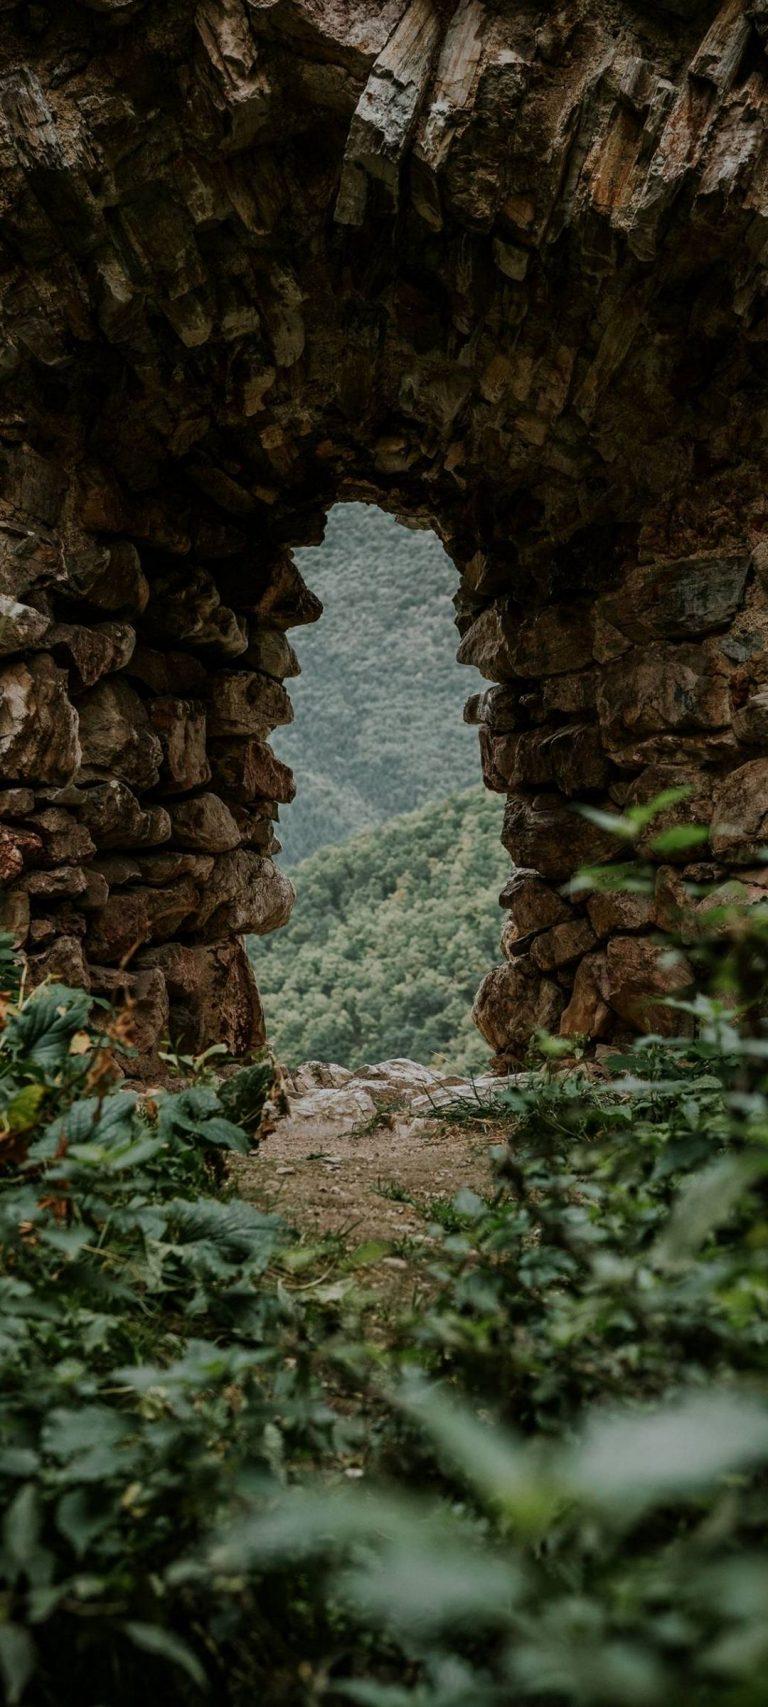 Stone Cave Grass Nature 1080x2400 768x1707